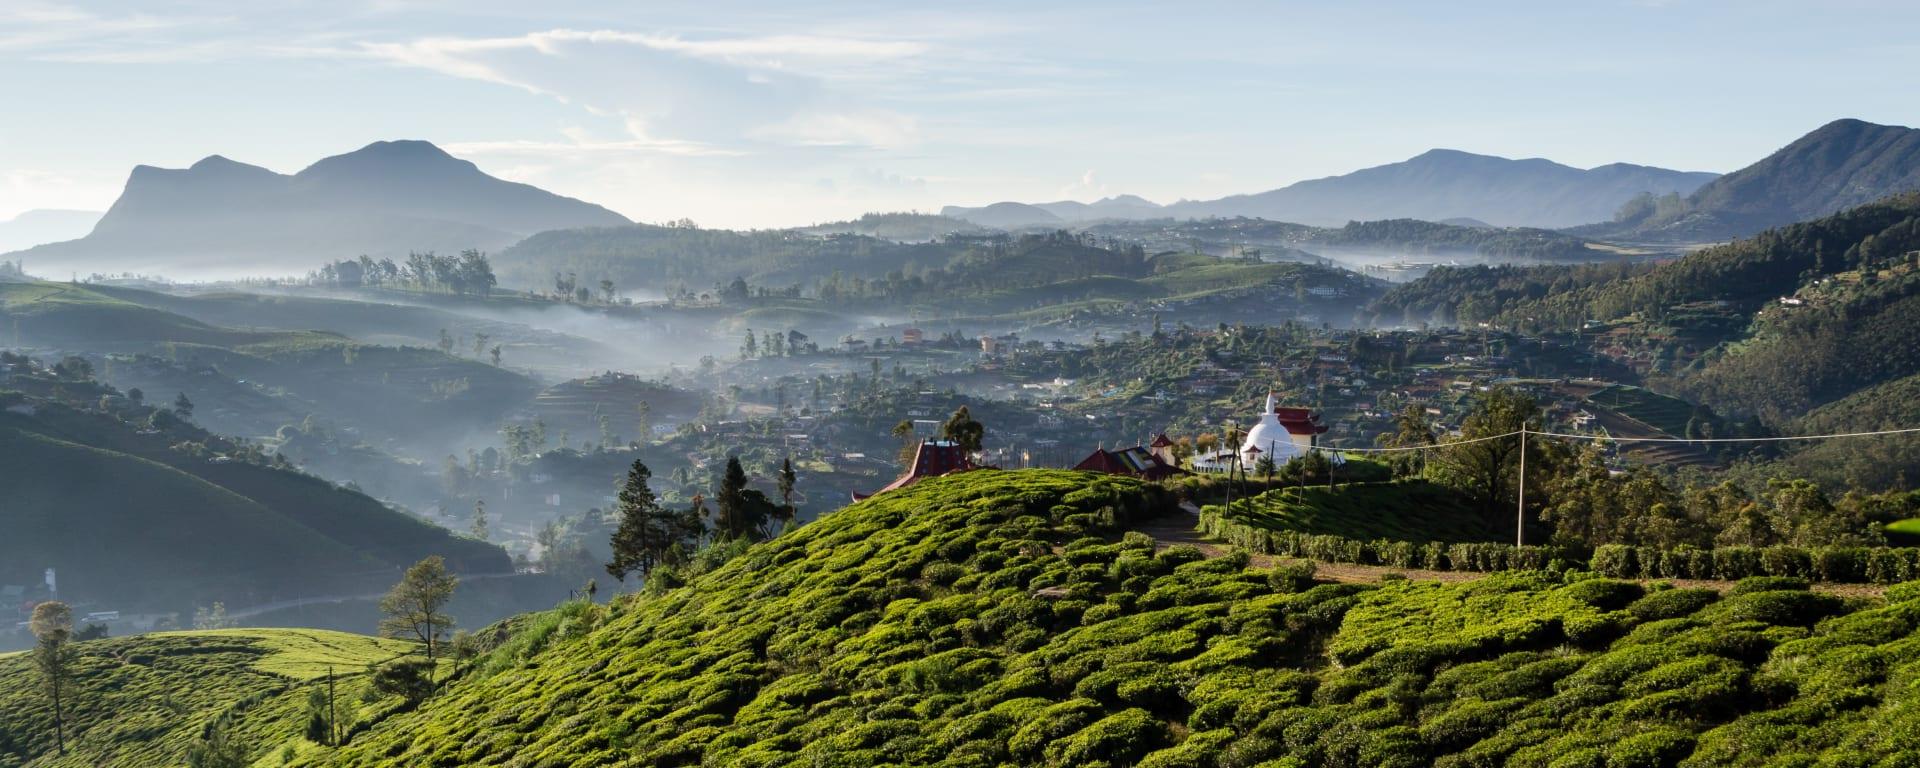 Naturpfade Sri Lankas ab Colombo: Sri Lanka Nuwara Eliya Teefelder